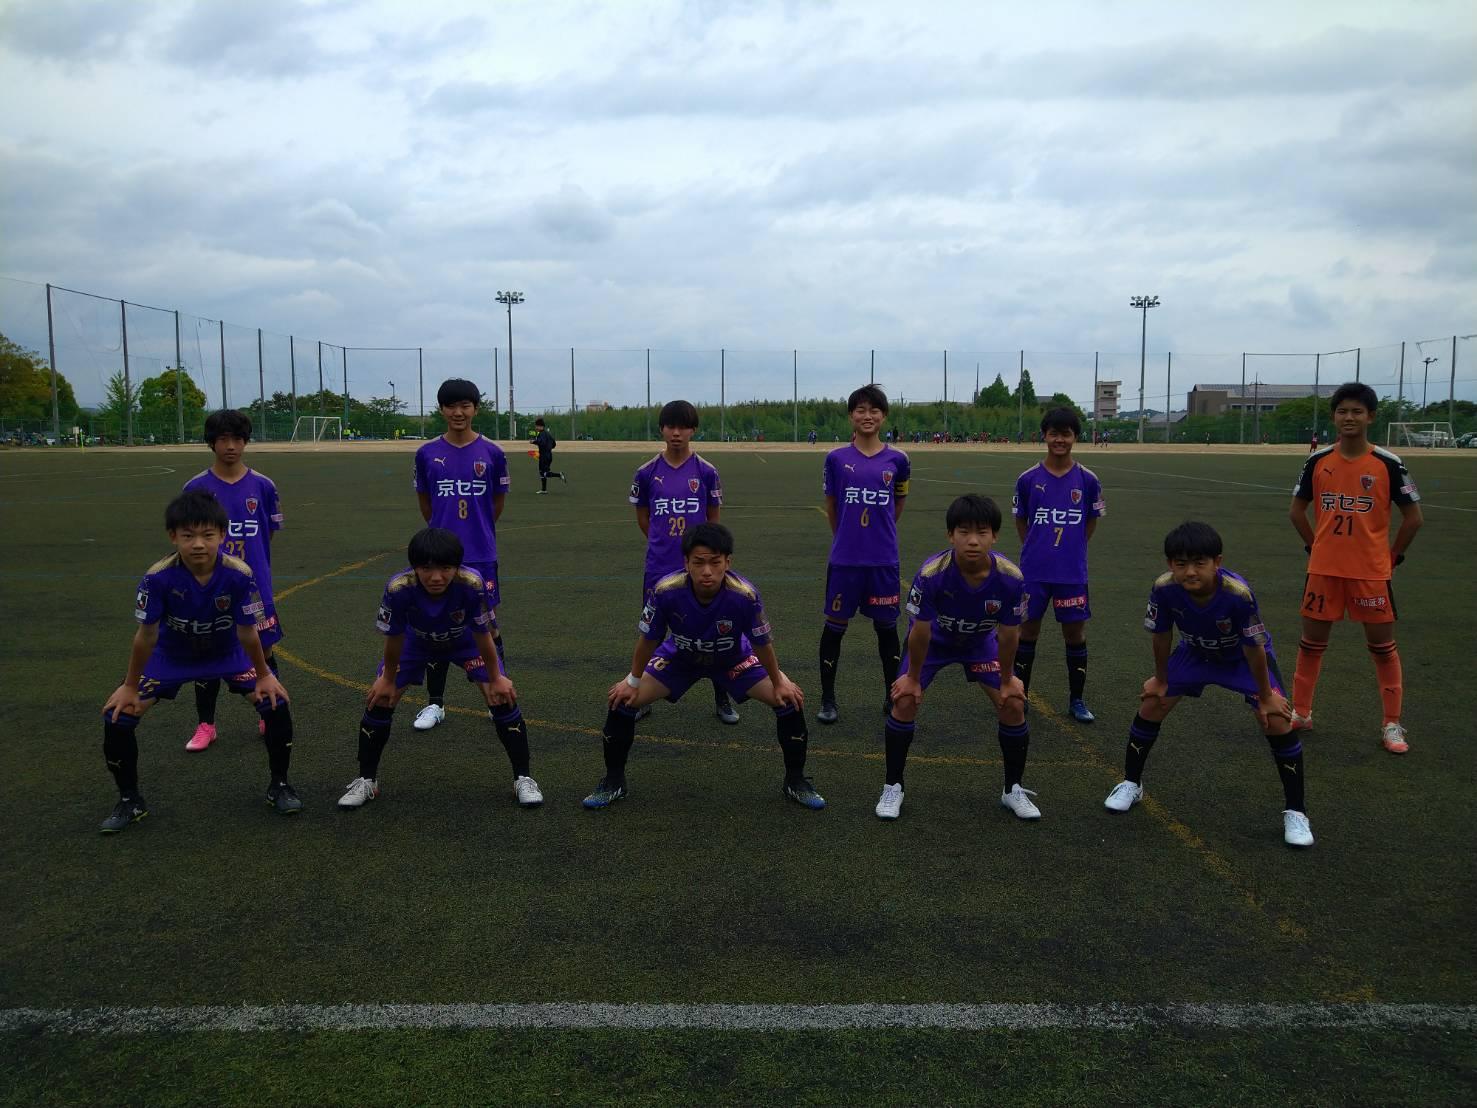 【U-15】高円宮杯JFA U-15サッカーリーグ滋賀2021 TOPリーグ第12節